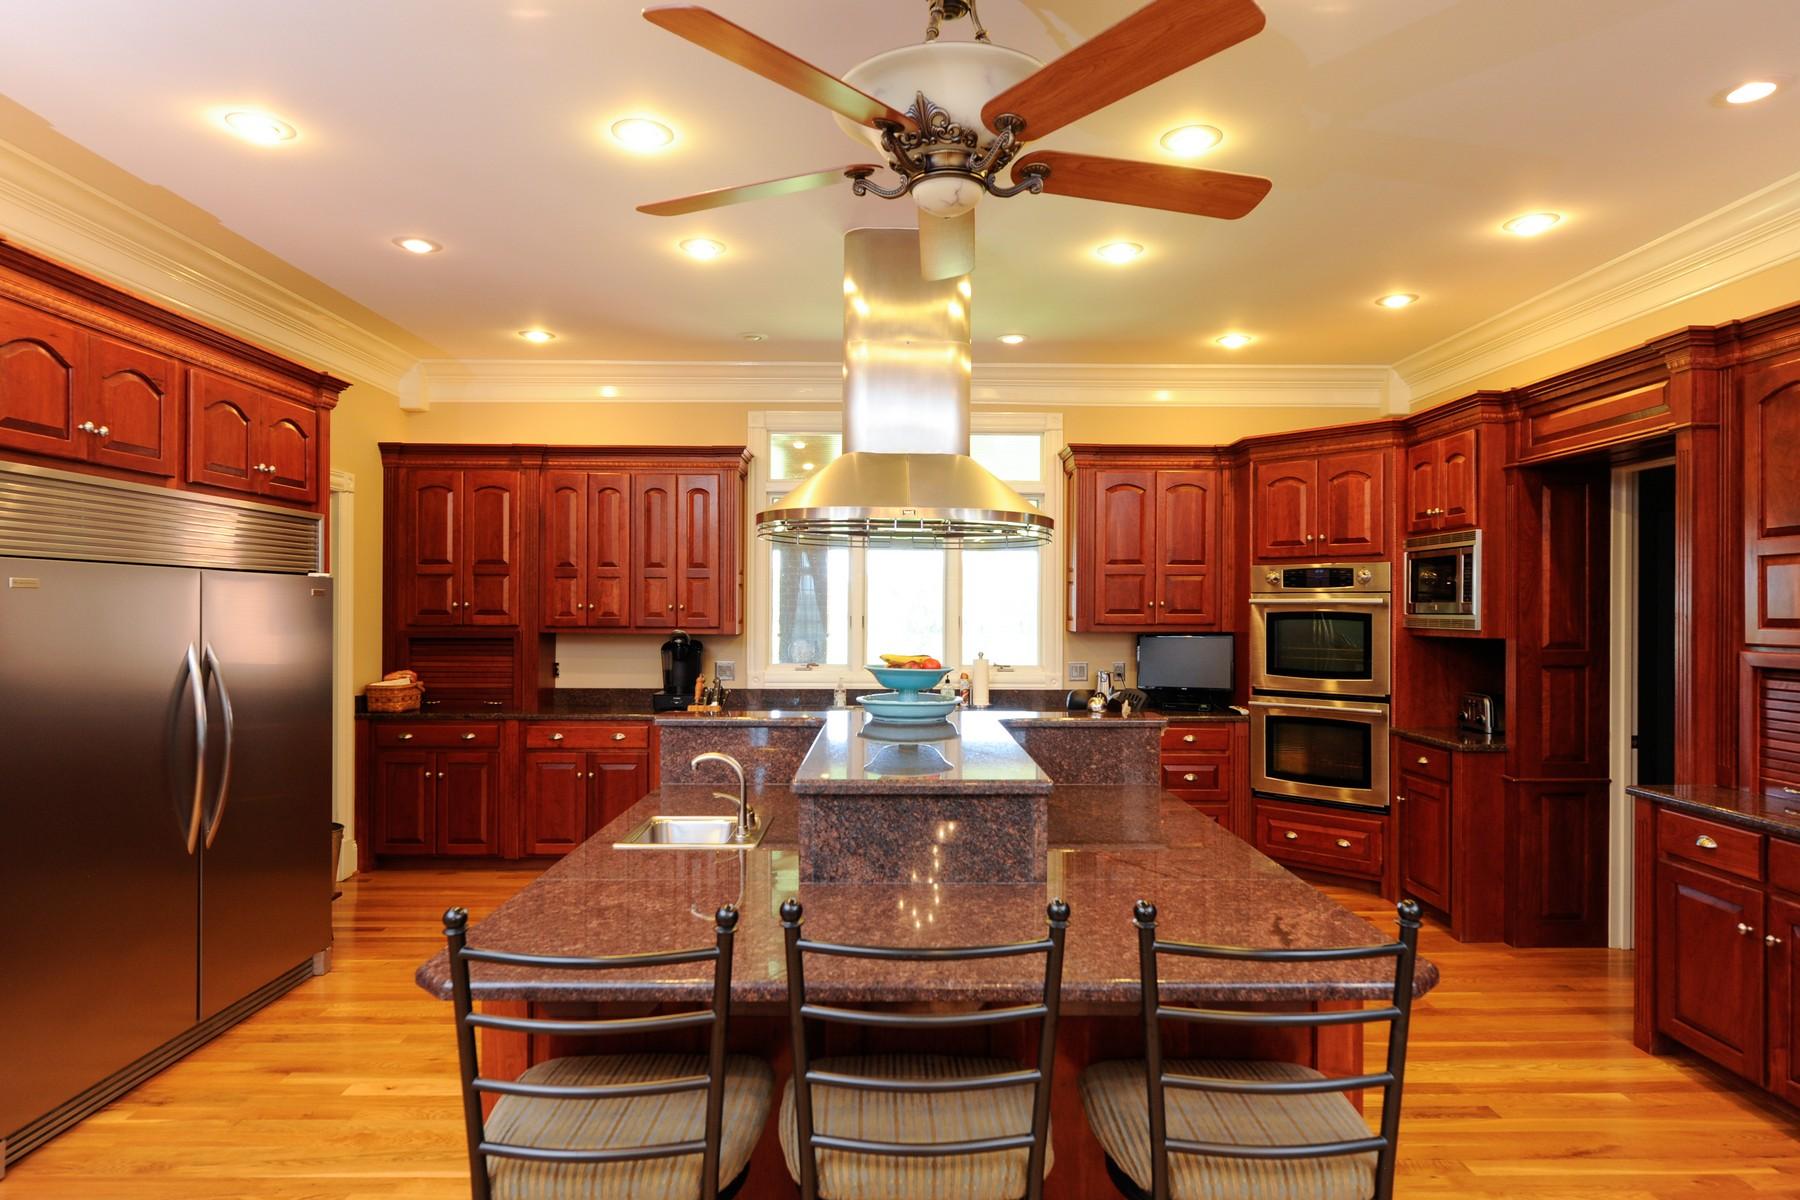 Additional photo for property listing at 801 Hawkins Cummins Rd 801 Hawkins Cummins Rd Paris, Kentucky 40361 United States